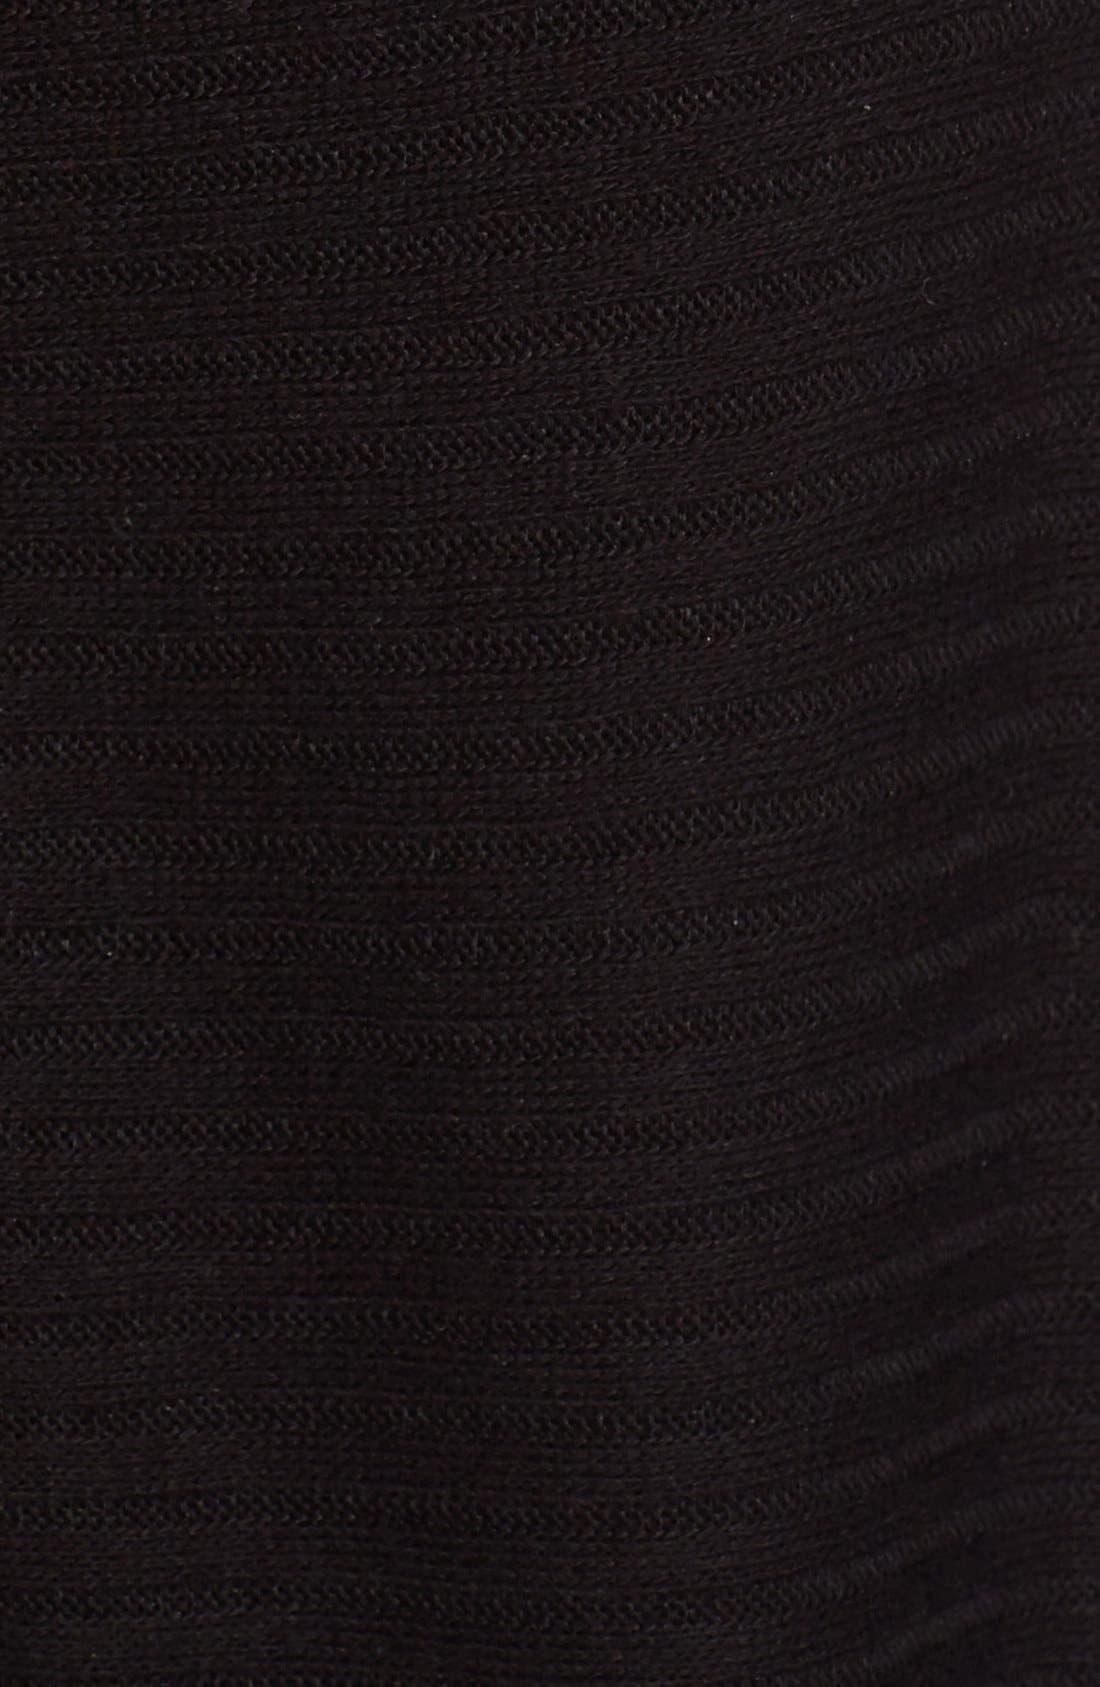 Lover Rib Split Back Pullover,                             Alternate thumbnail 5, color,                             Black